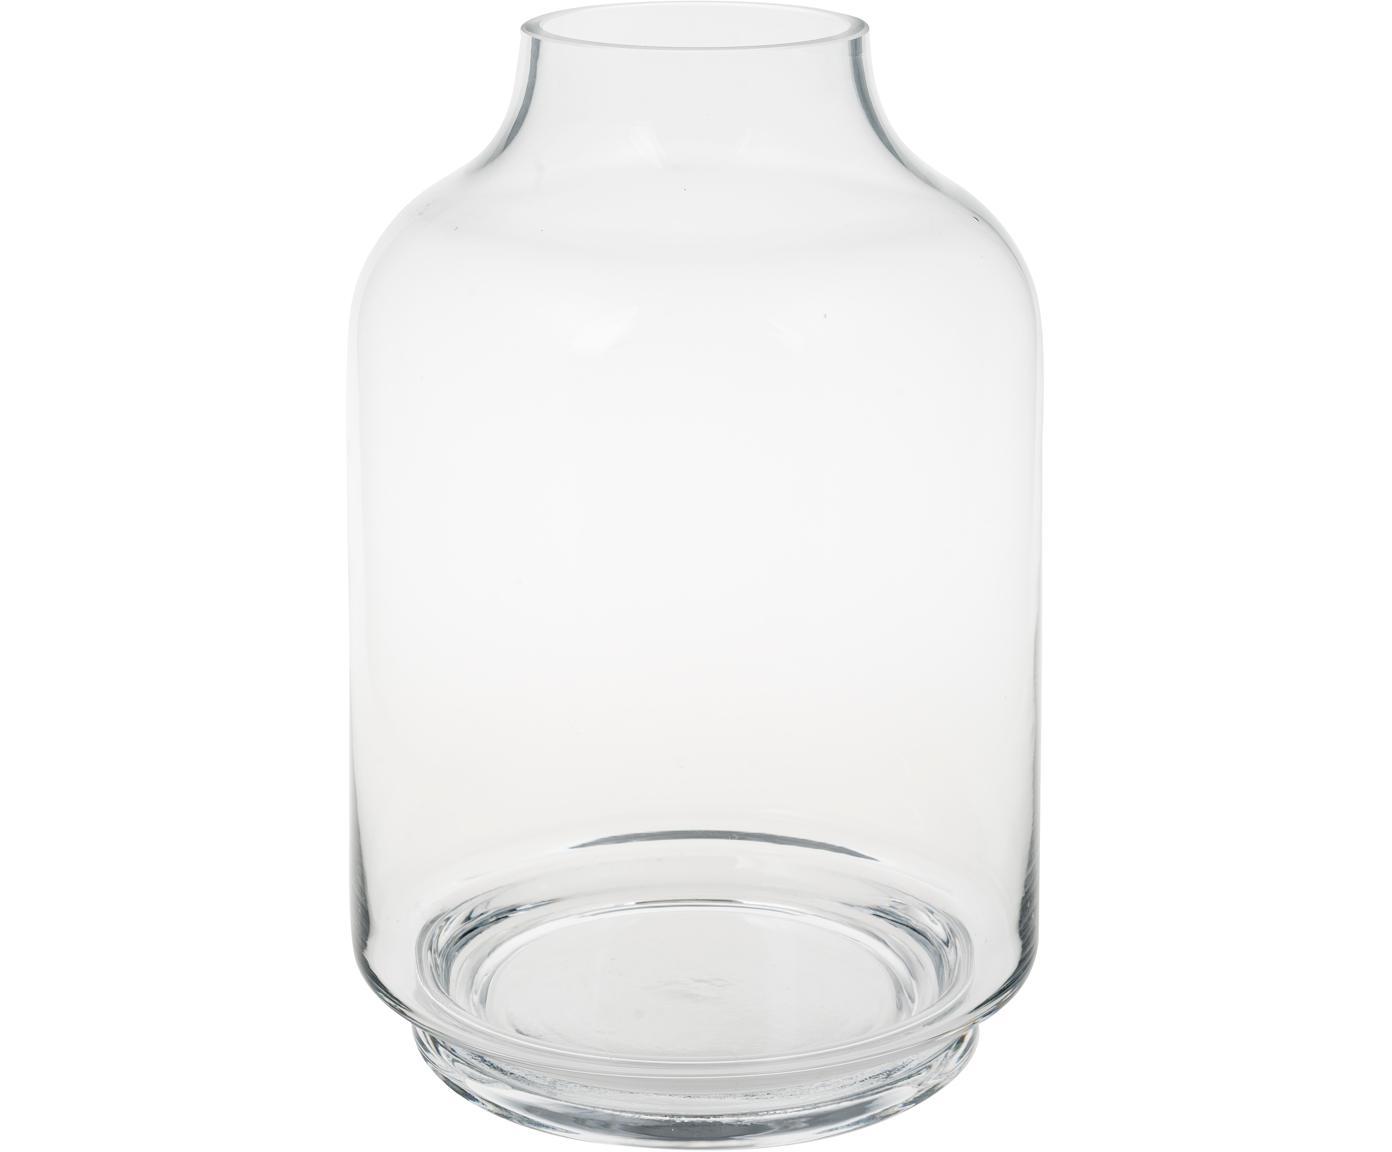 Glazen vaas Vibeke, Glas, Transparant, Ø 17 x H 26 cm